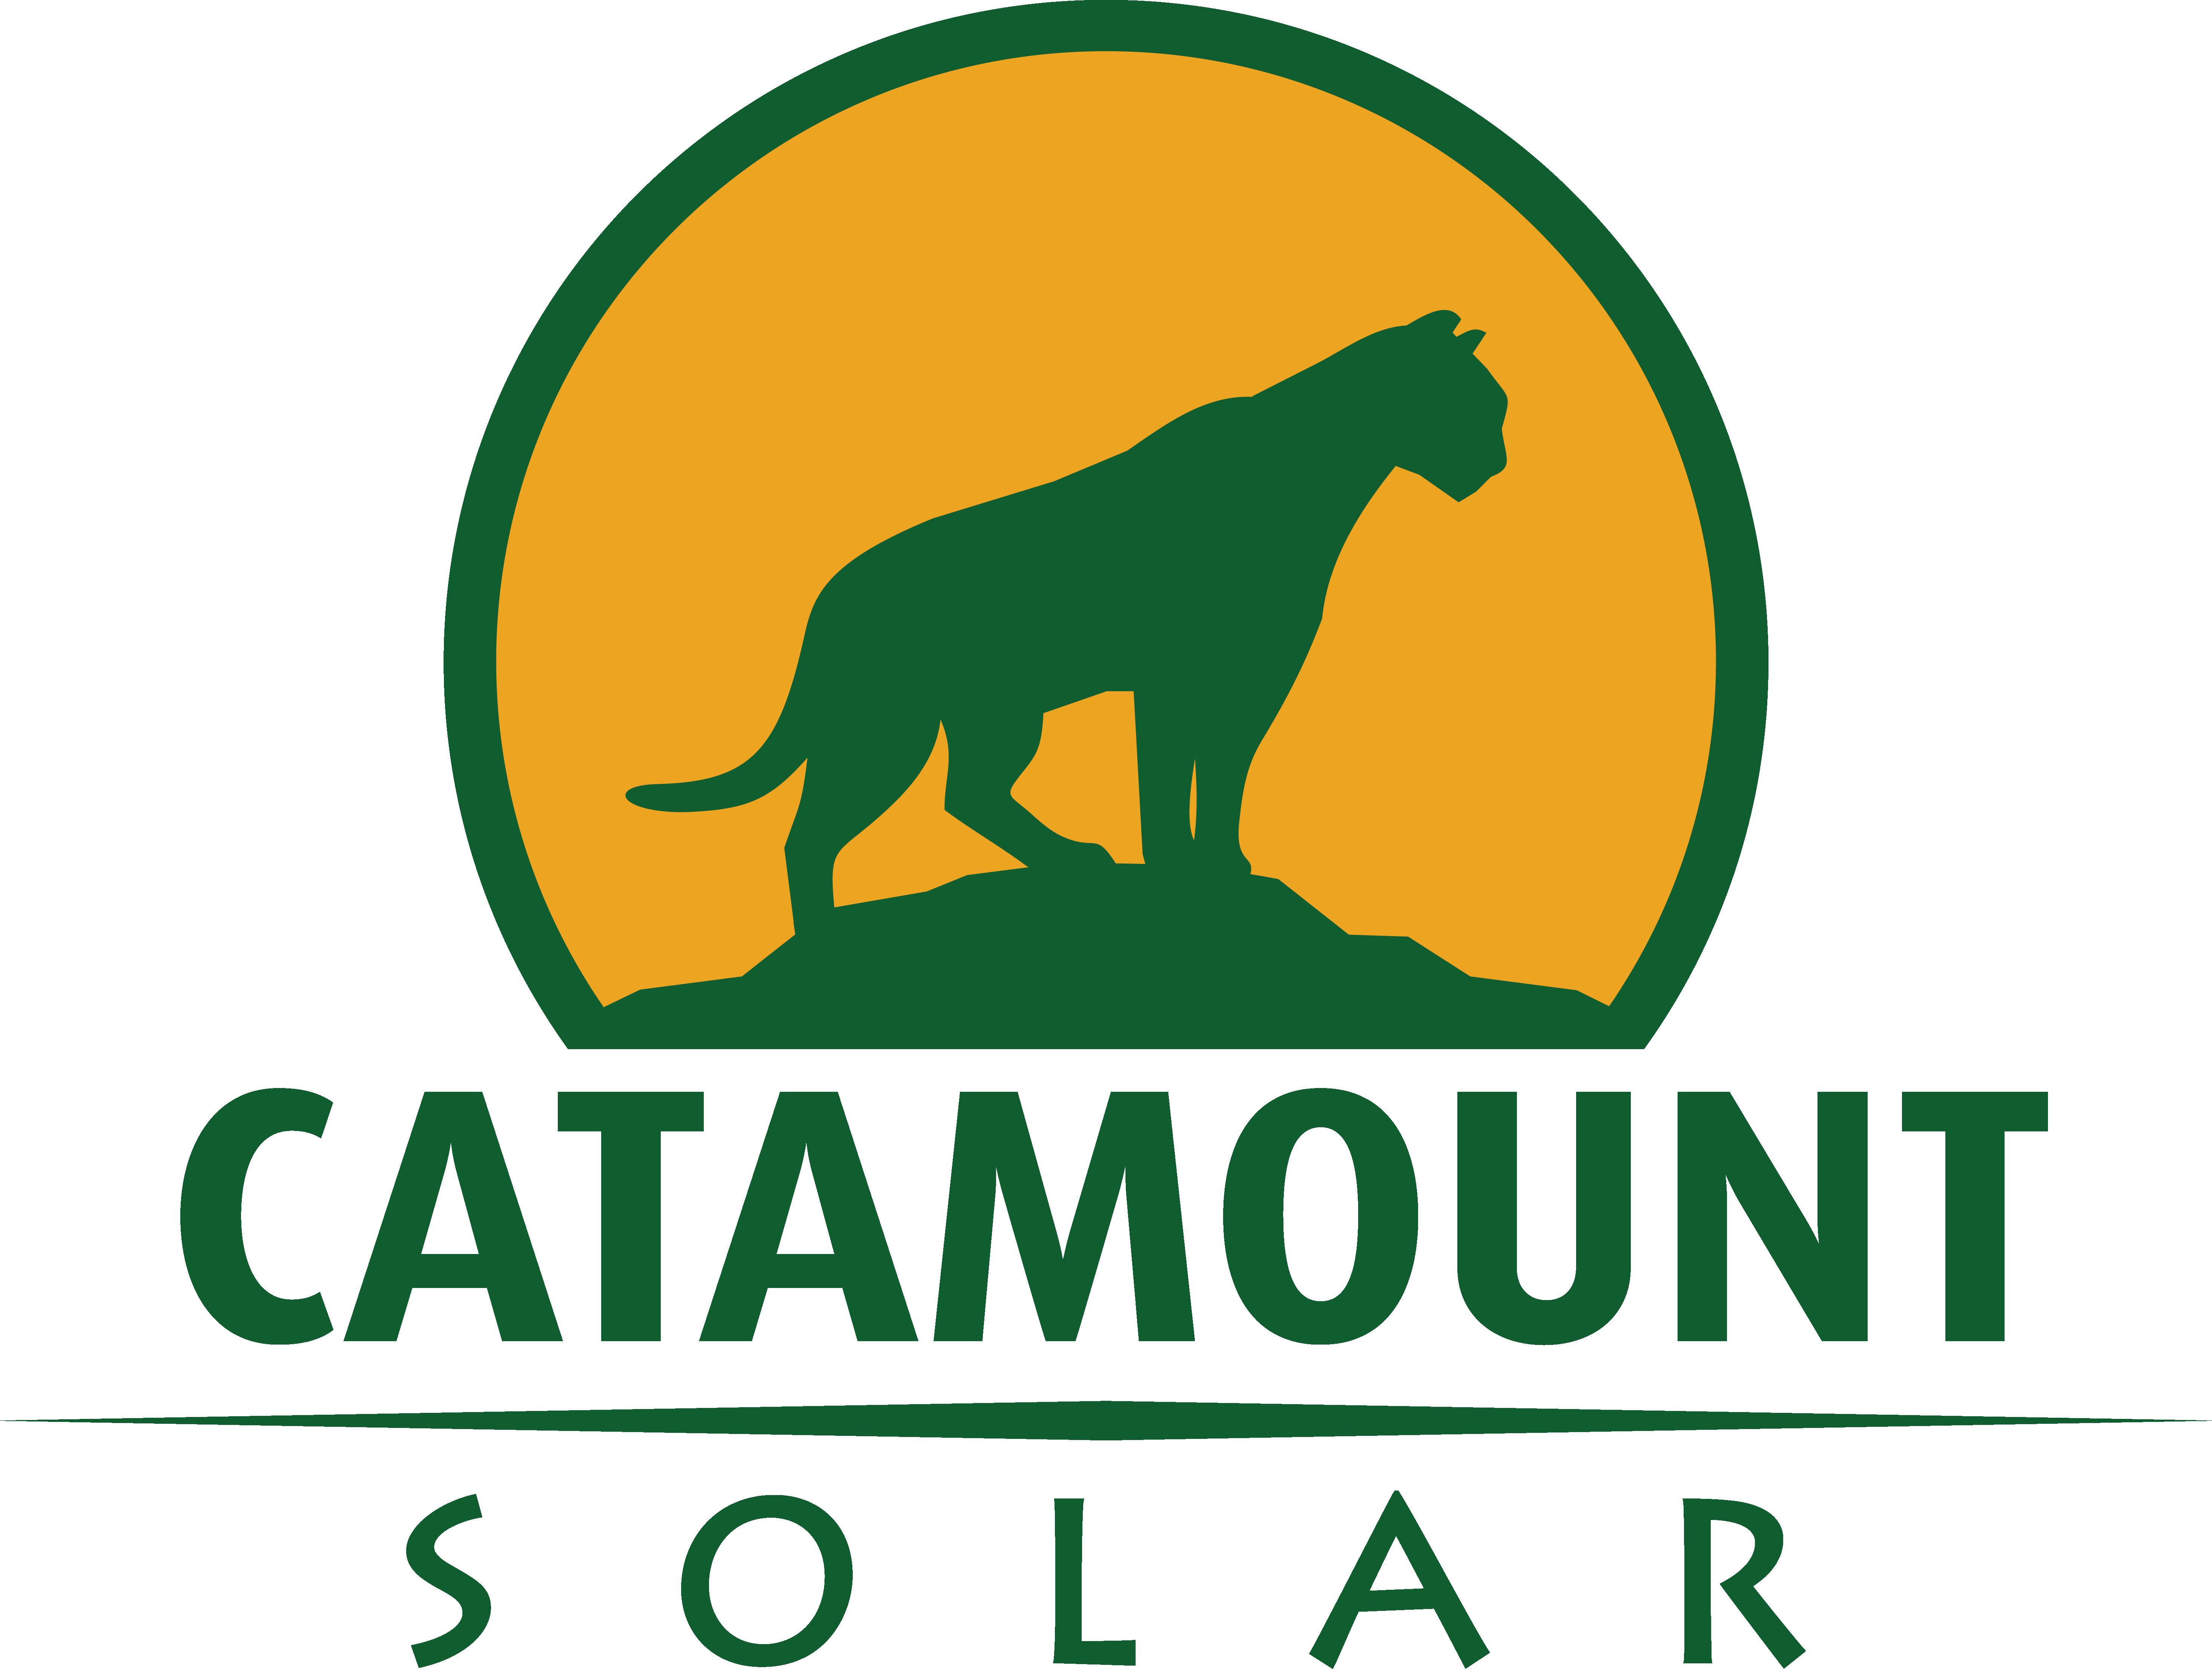 catamount_solar_logo2.png